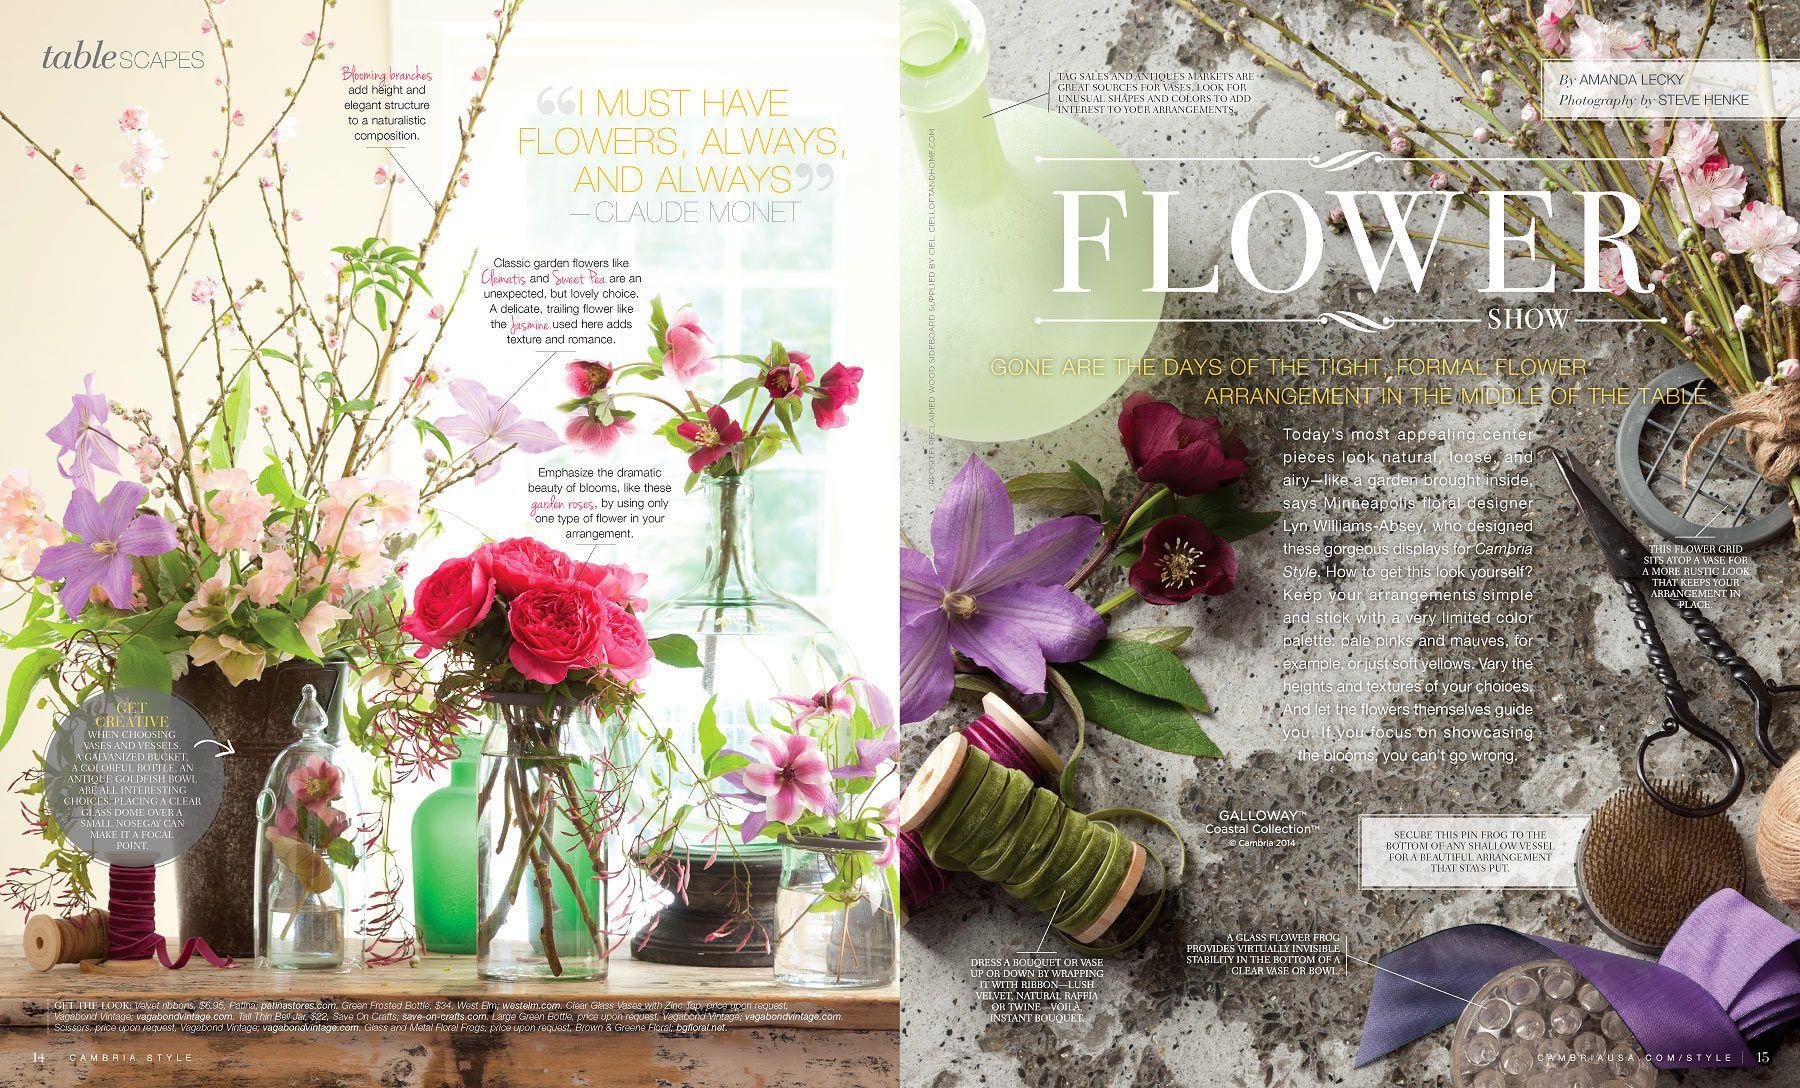 11-cambria_flowers_arranging_summer.jpg